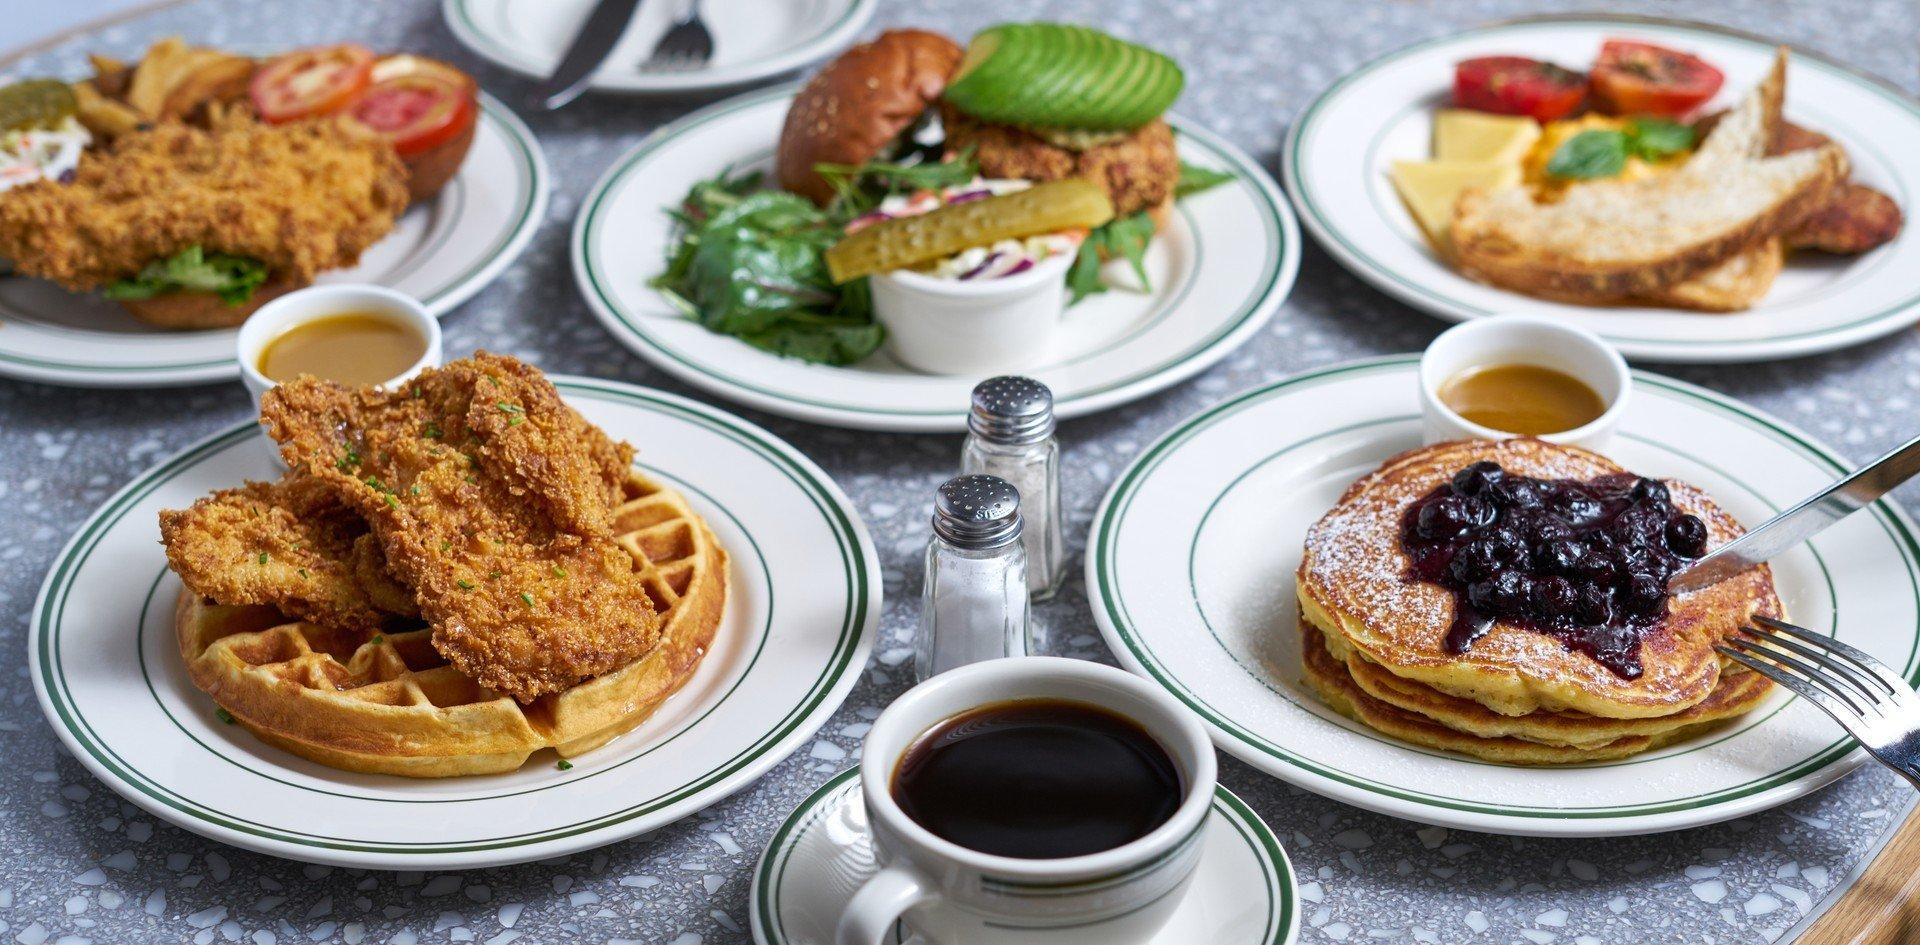 """Clinton St. Baking Company"" ร้านอาหารเช้าชื่อดังจากนิวยอร์ก"